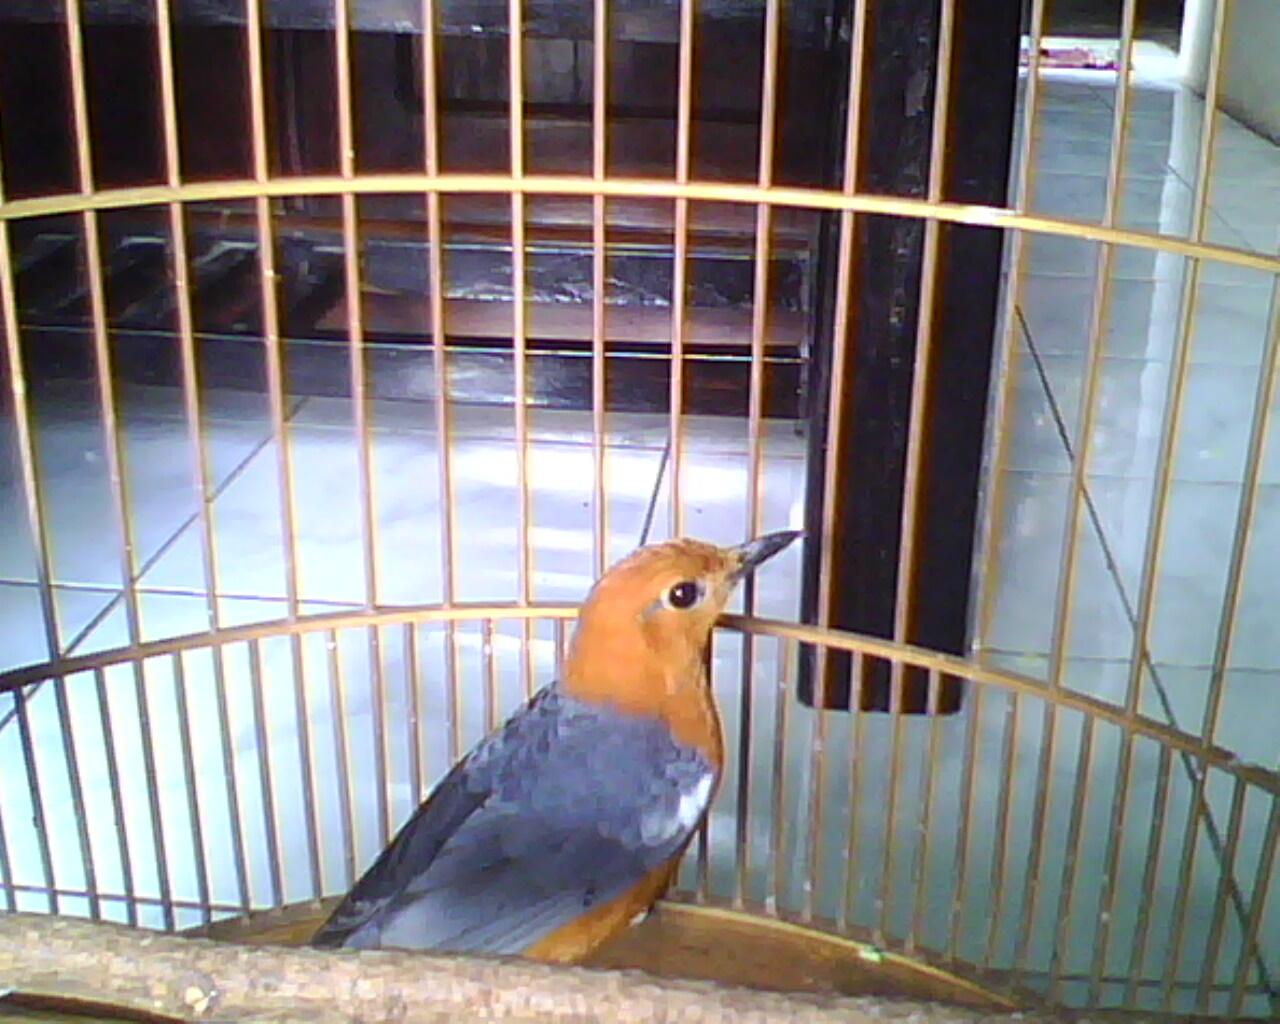 Belajar Seo Jakarta Cara Membedakan Burung Kenari Merah Wortel Asli Dengan Yang Palsu